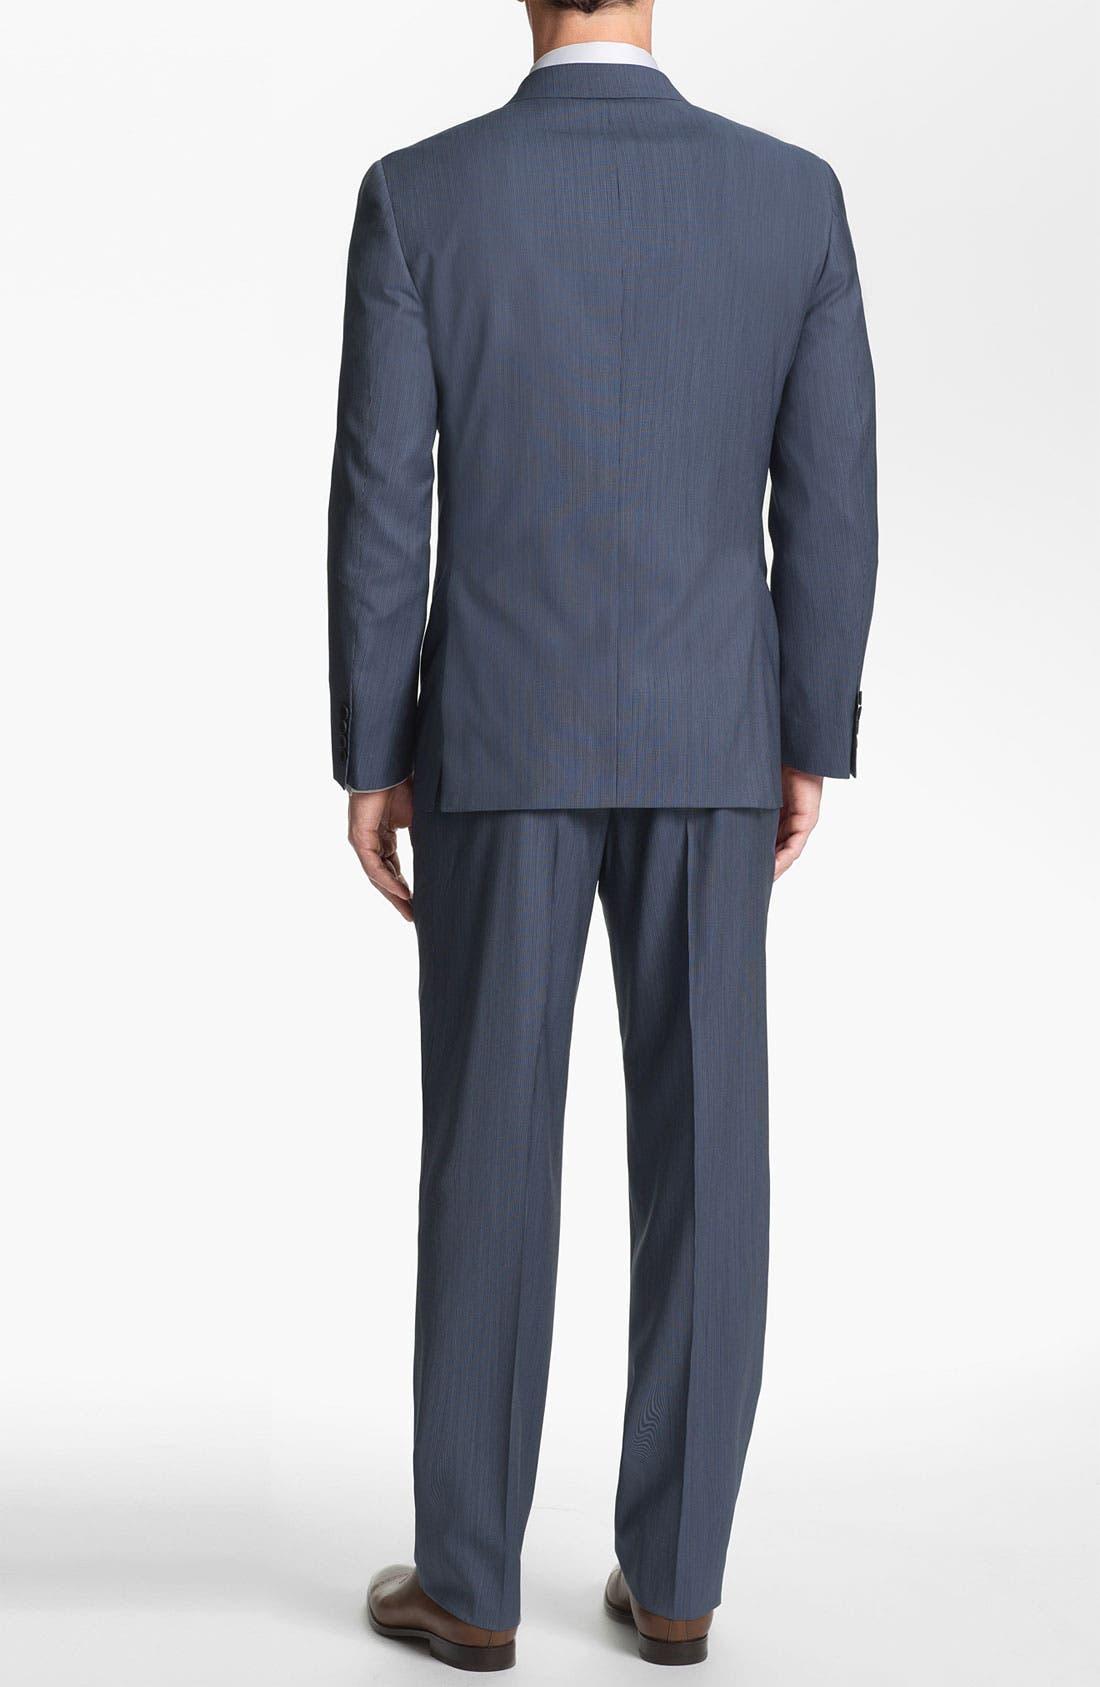 Alternate Image 3  - Joseph Abboud 'Profile' Trim Fit Stripe Wool Suit